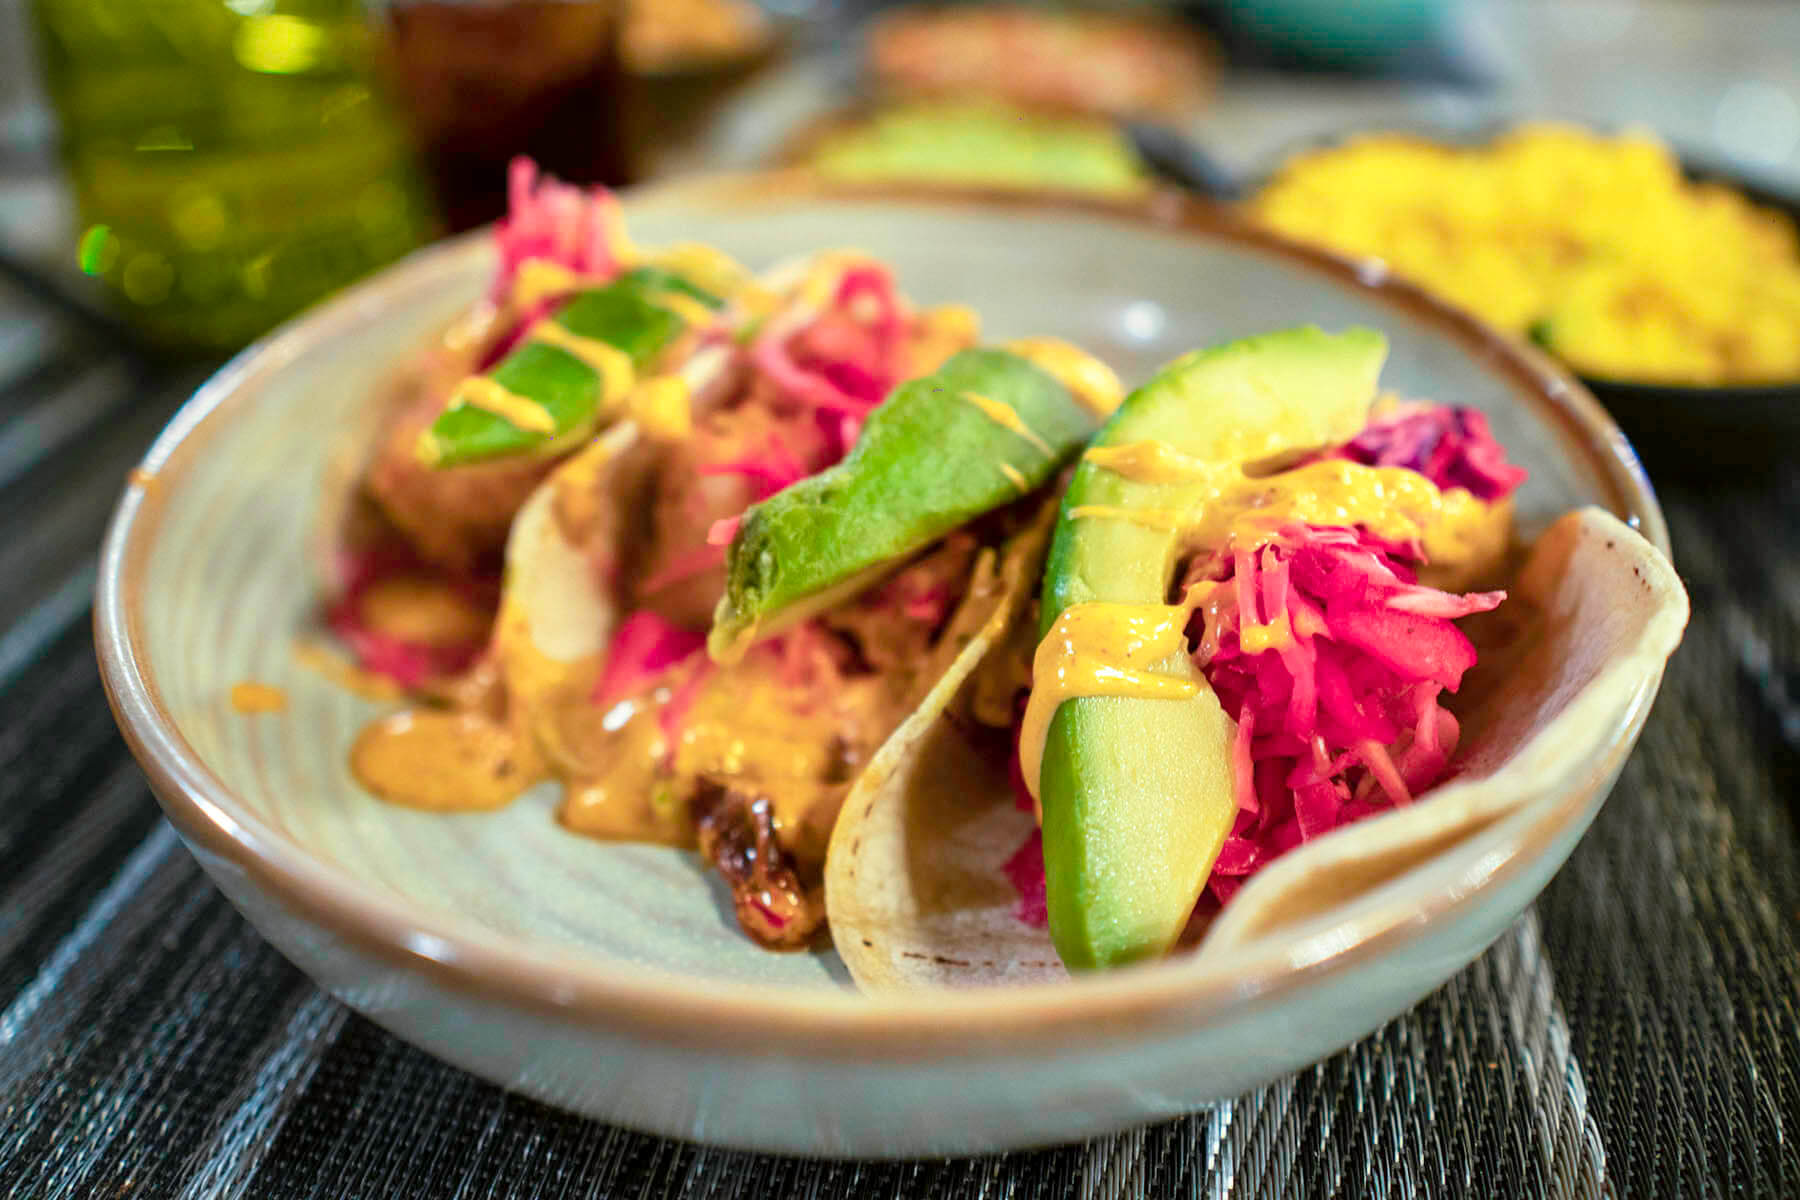 tacos-tex-mex-planet-hollywood-beach-resort-costa-rica-review